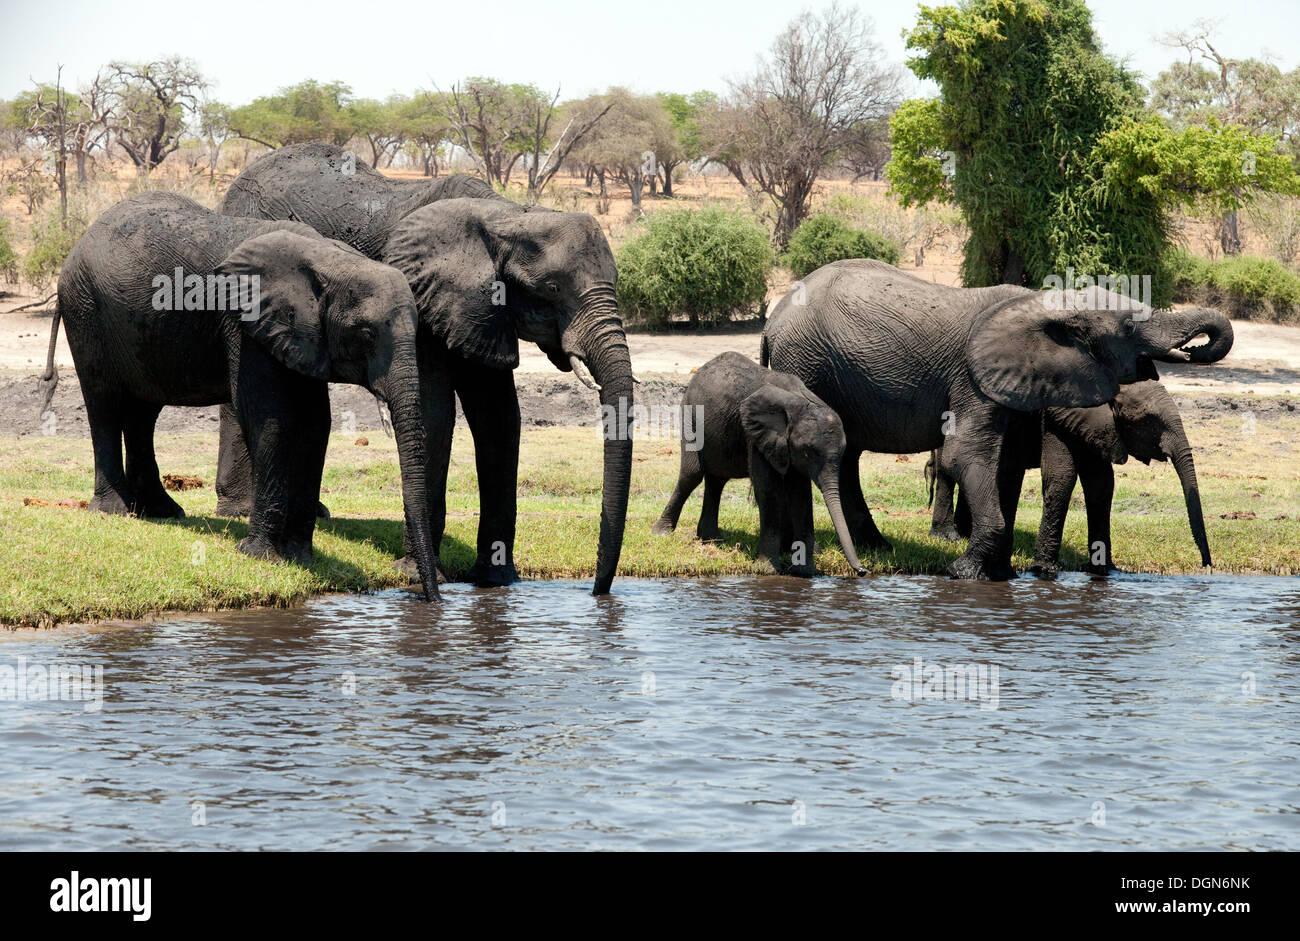 A herd of African elephants drinking, Chobe river, Chobe national park, Botswana Africa - Stock Image